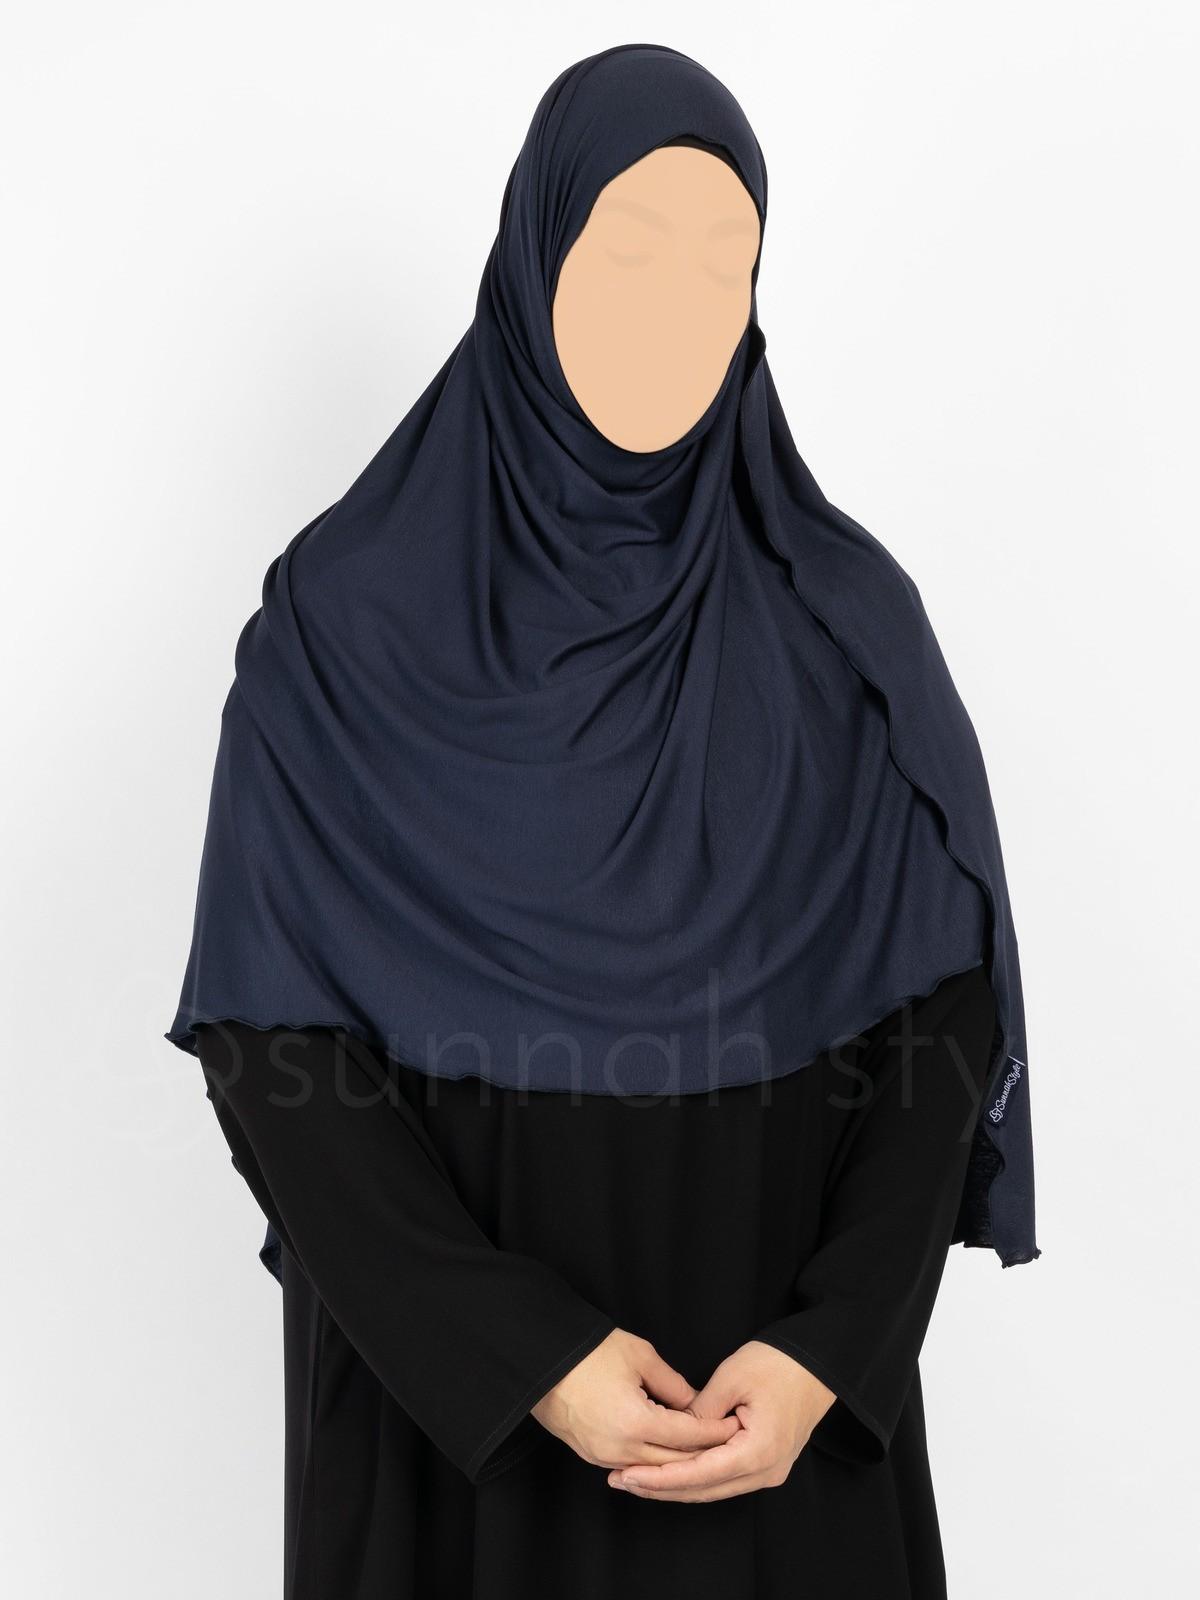 Sunnah Style Urban Shayla (Soft Jersey) - Large (Navy Blue)